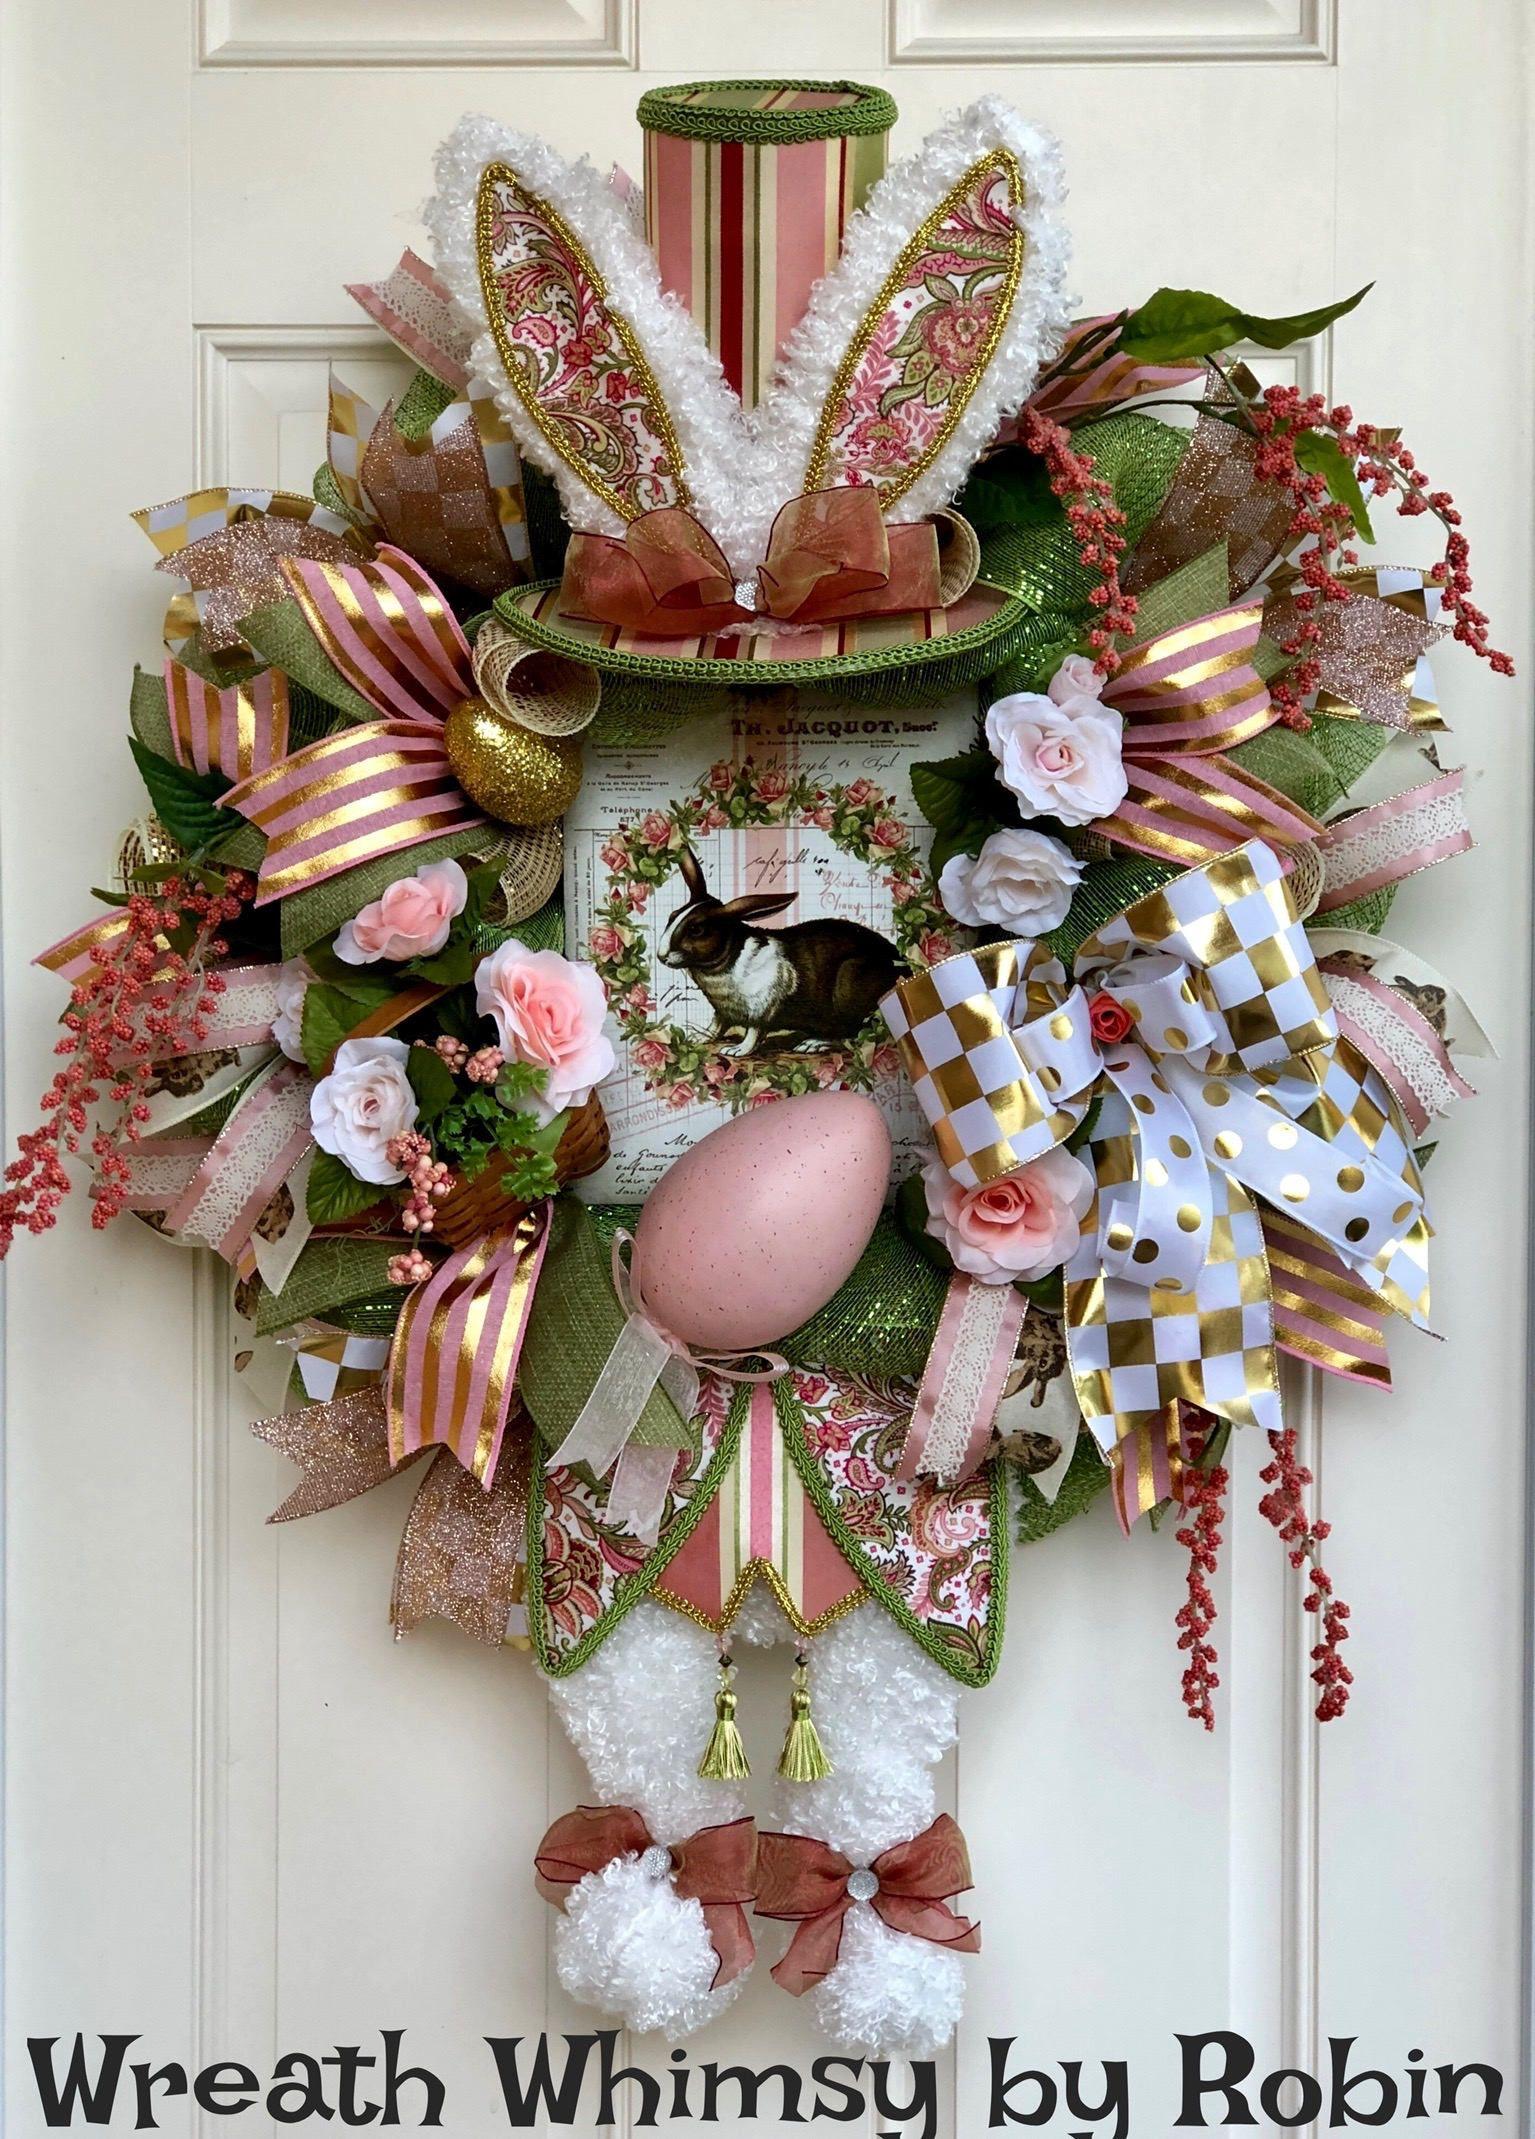 Easter WreathEaster WreathsEaster Decor Easter Party DecorSpring WreathSpring WreathsEaster Door DecorEaster Wall DecorEaster Rabbit